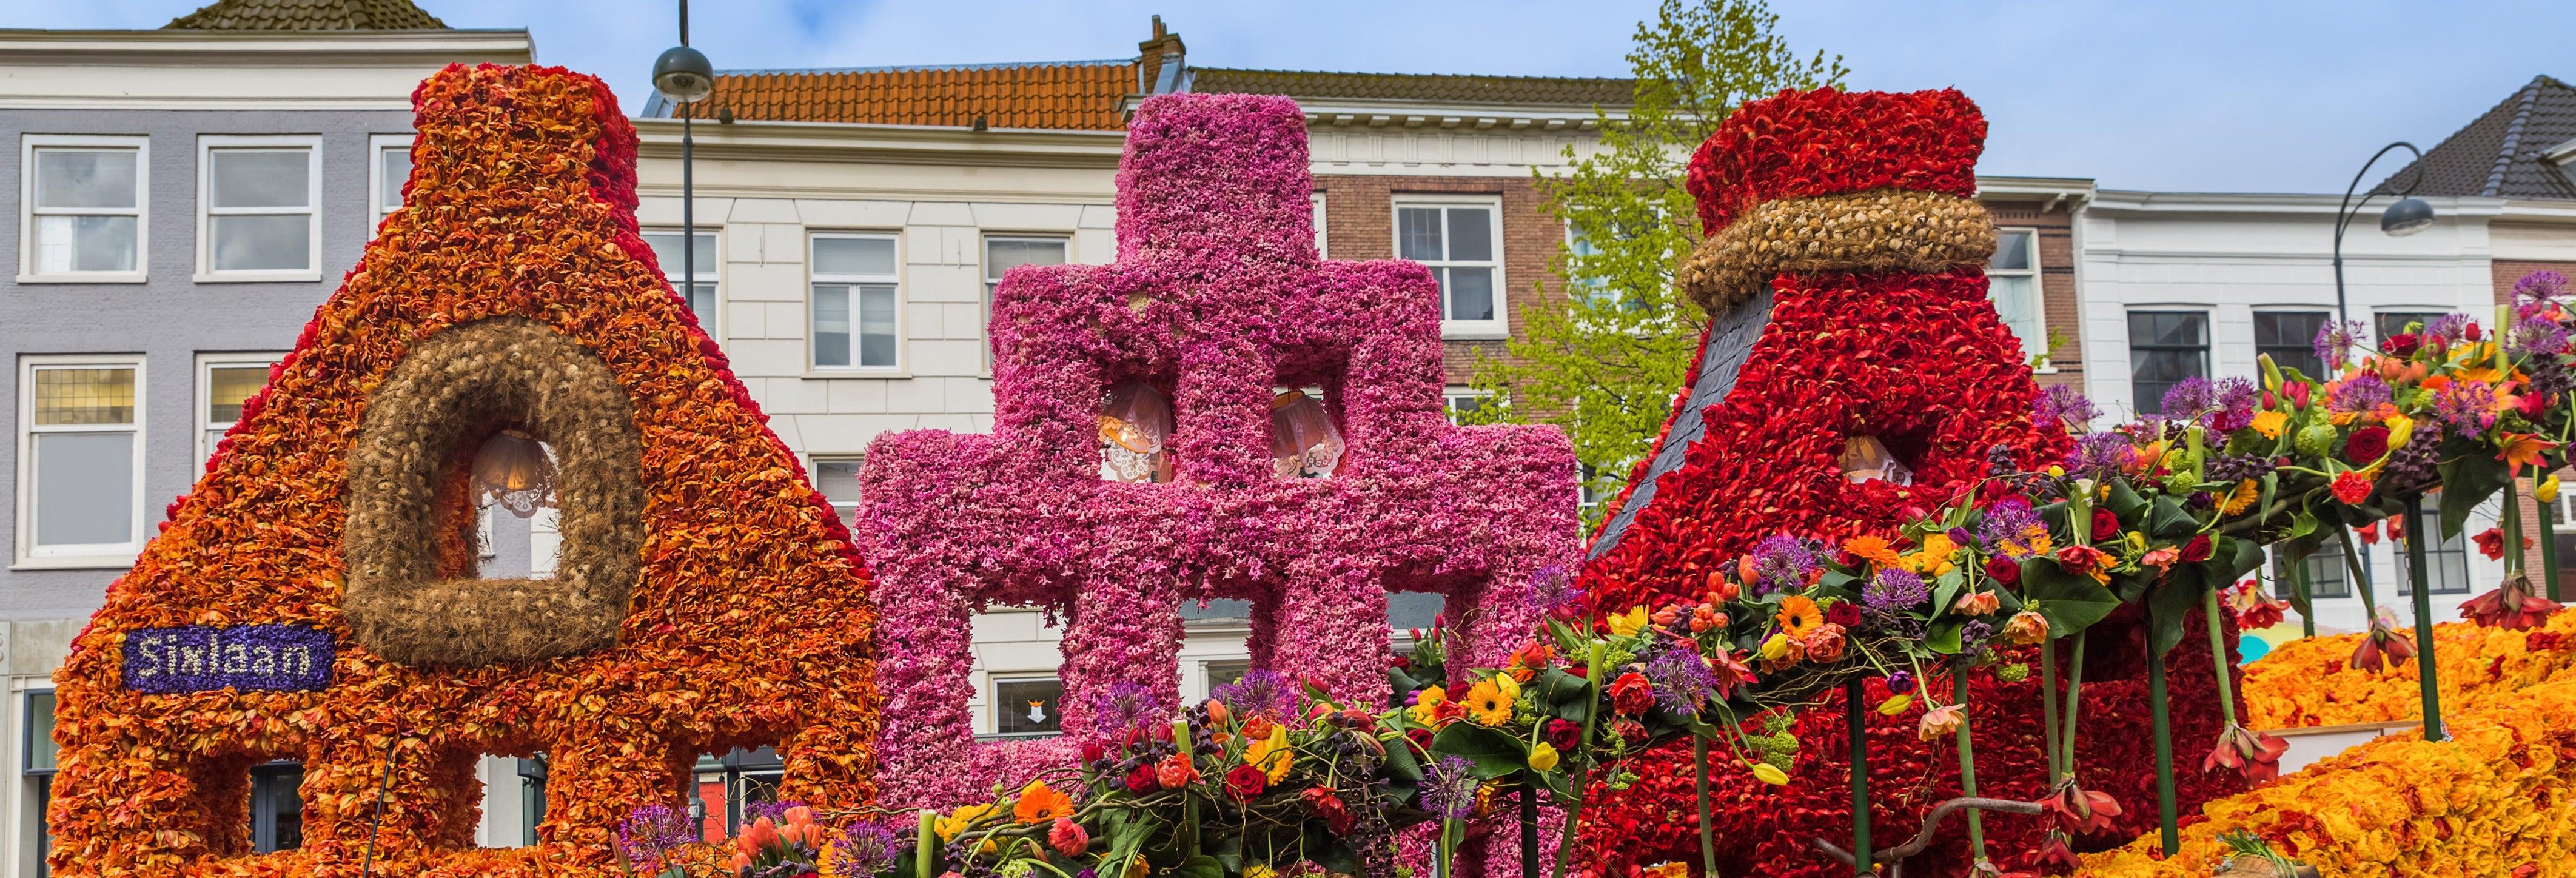 Tour en bicicleta por Haarlem